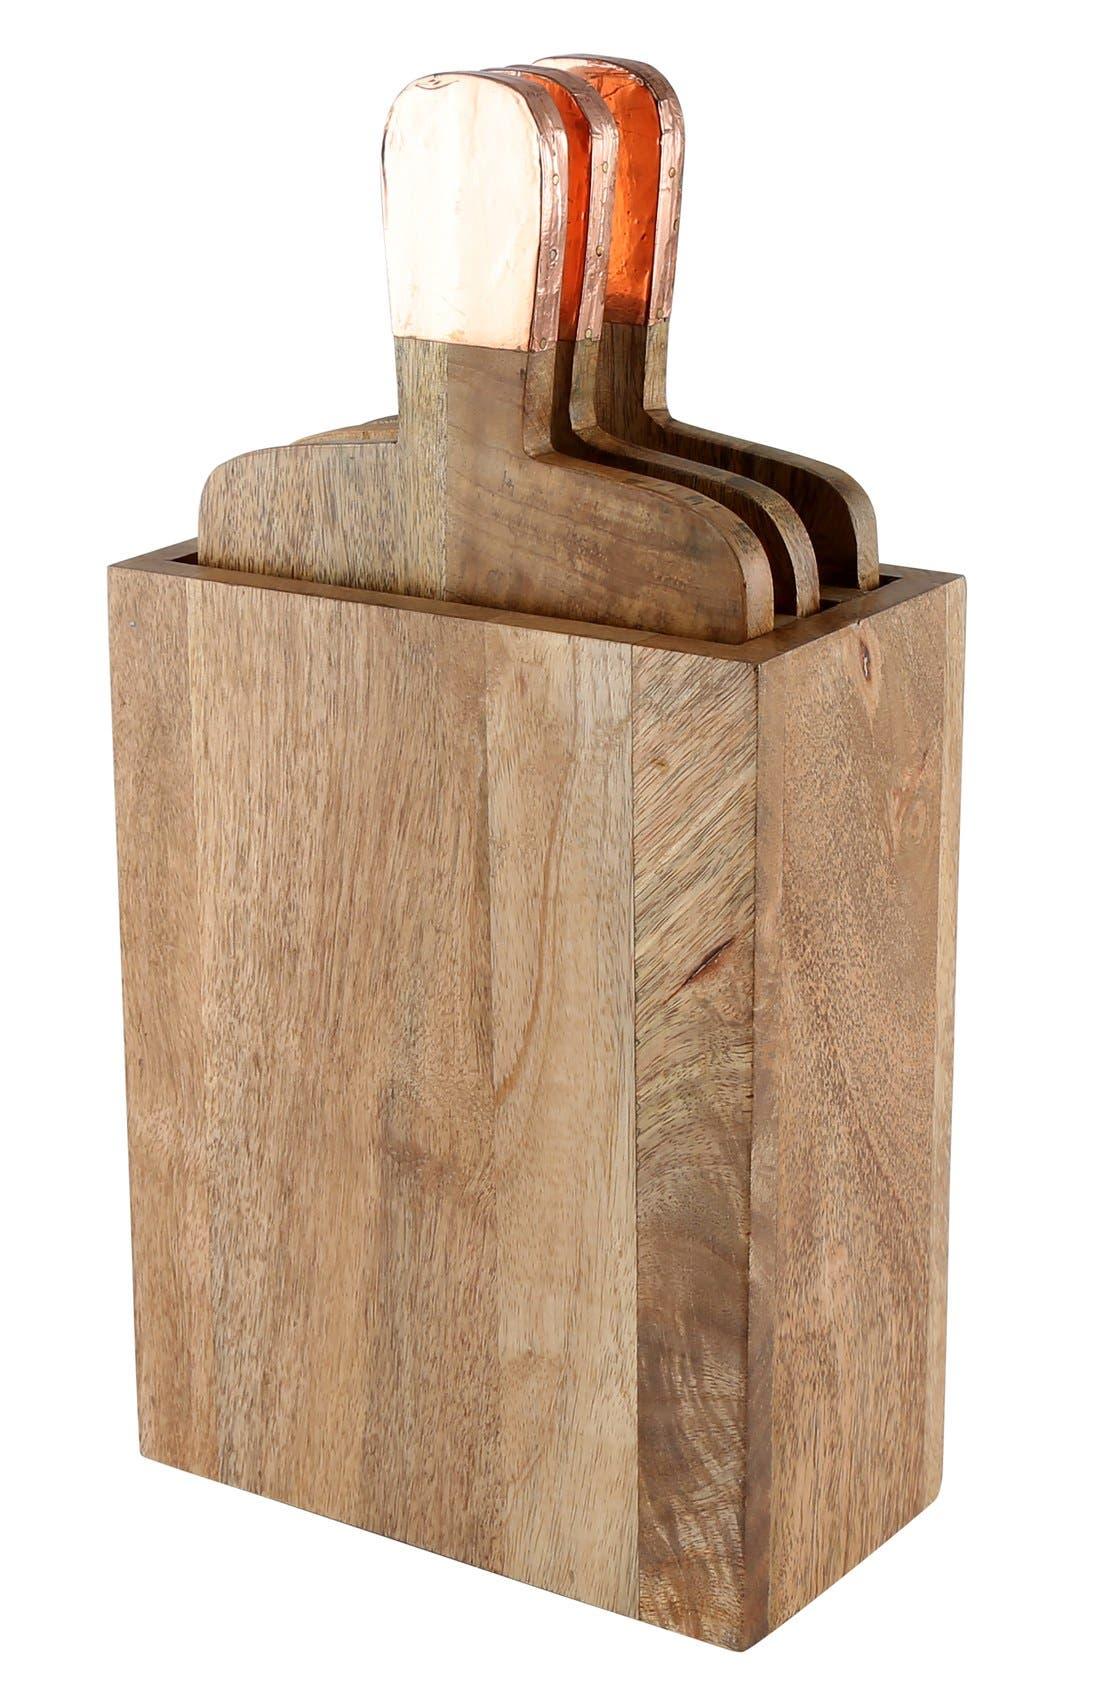 'Urban Farm' Mango Wood Serving Boards & Holder,                         Main,                         color, Copper